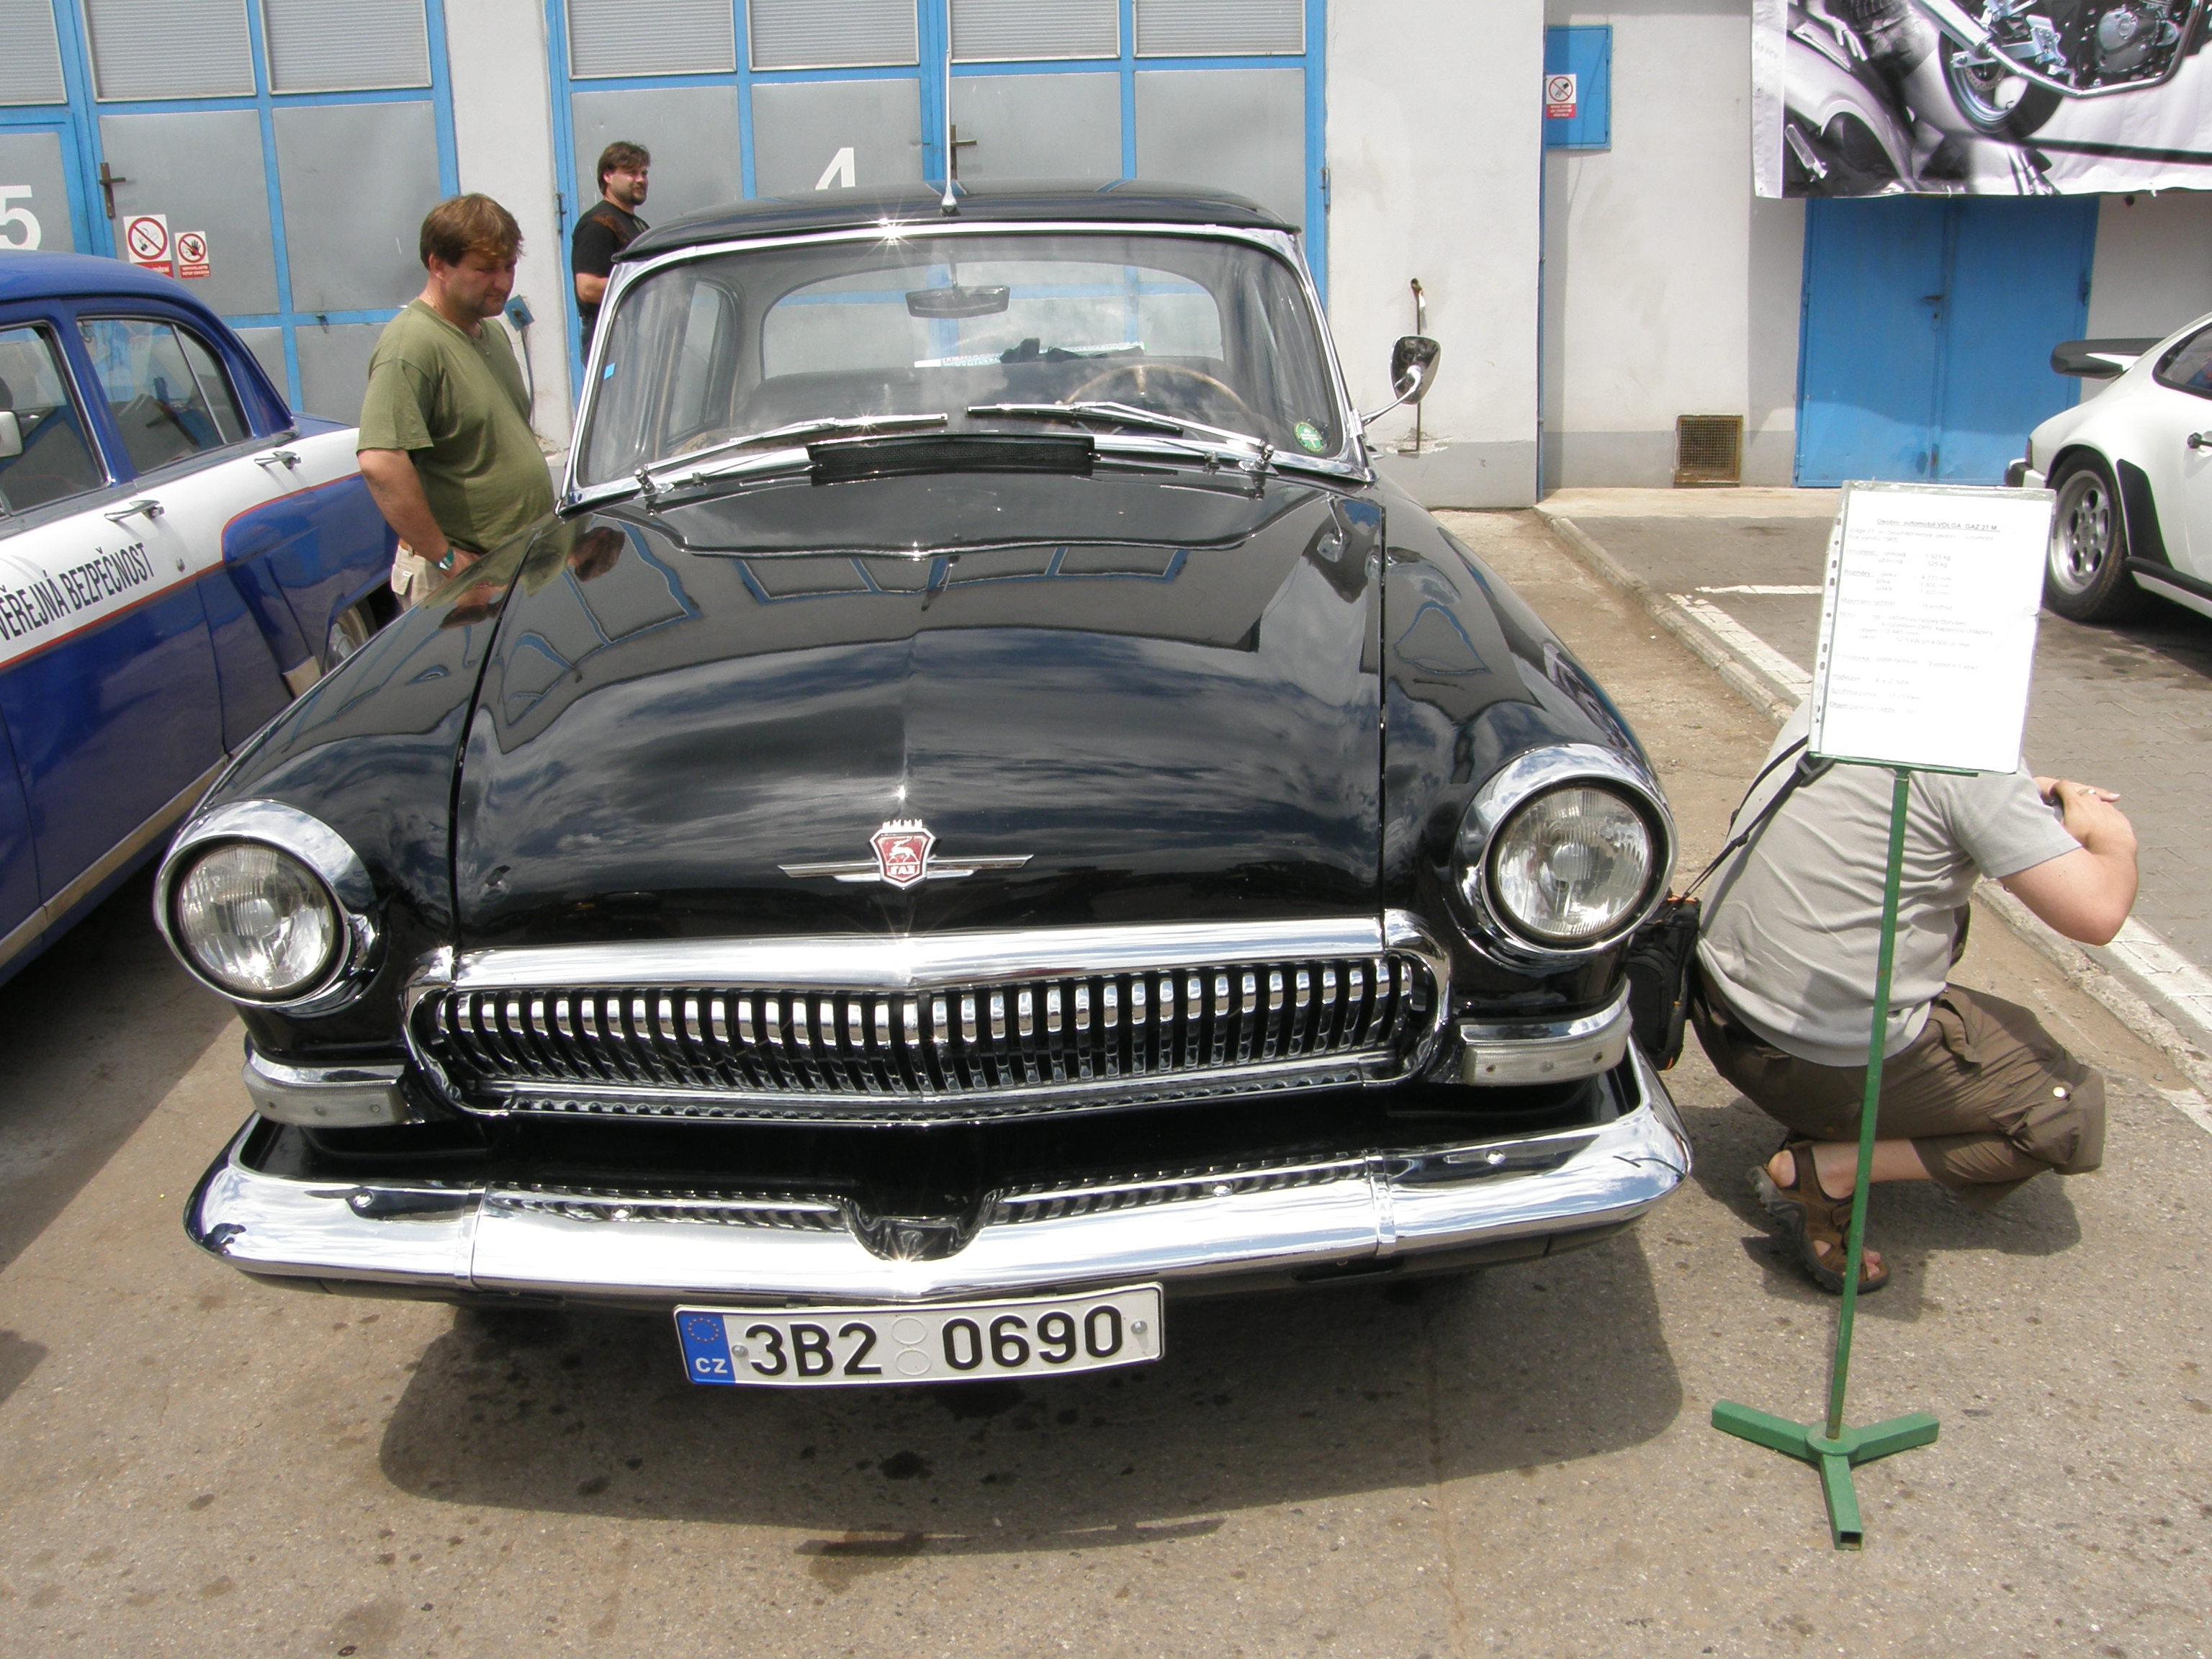 1966 Volga GAZ-21 | Featured Classic Cars | Pinterest | Bmw motors ...